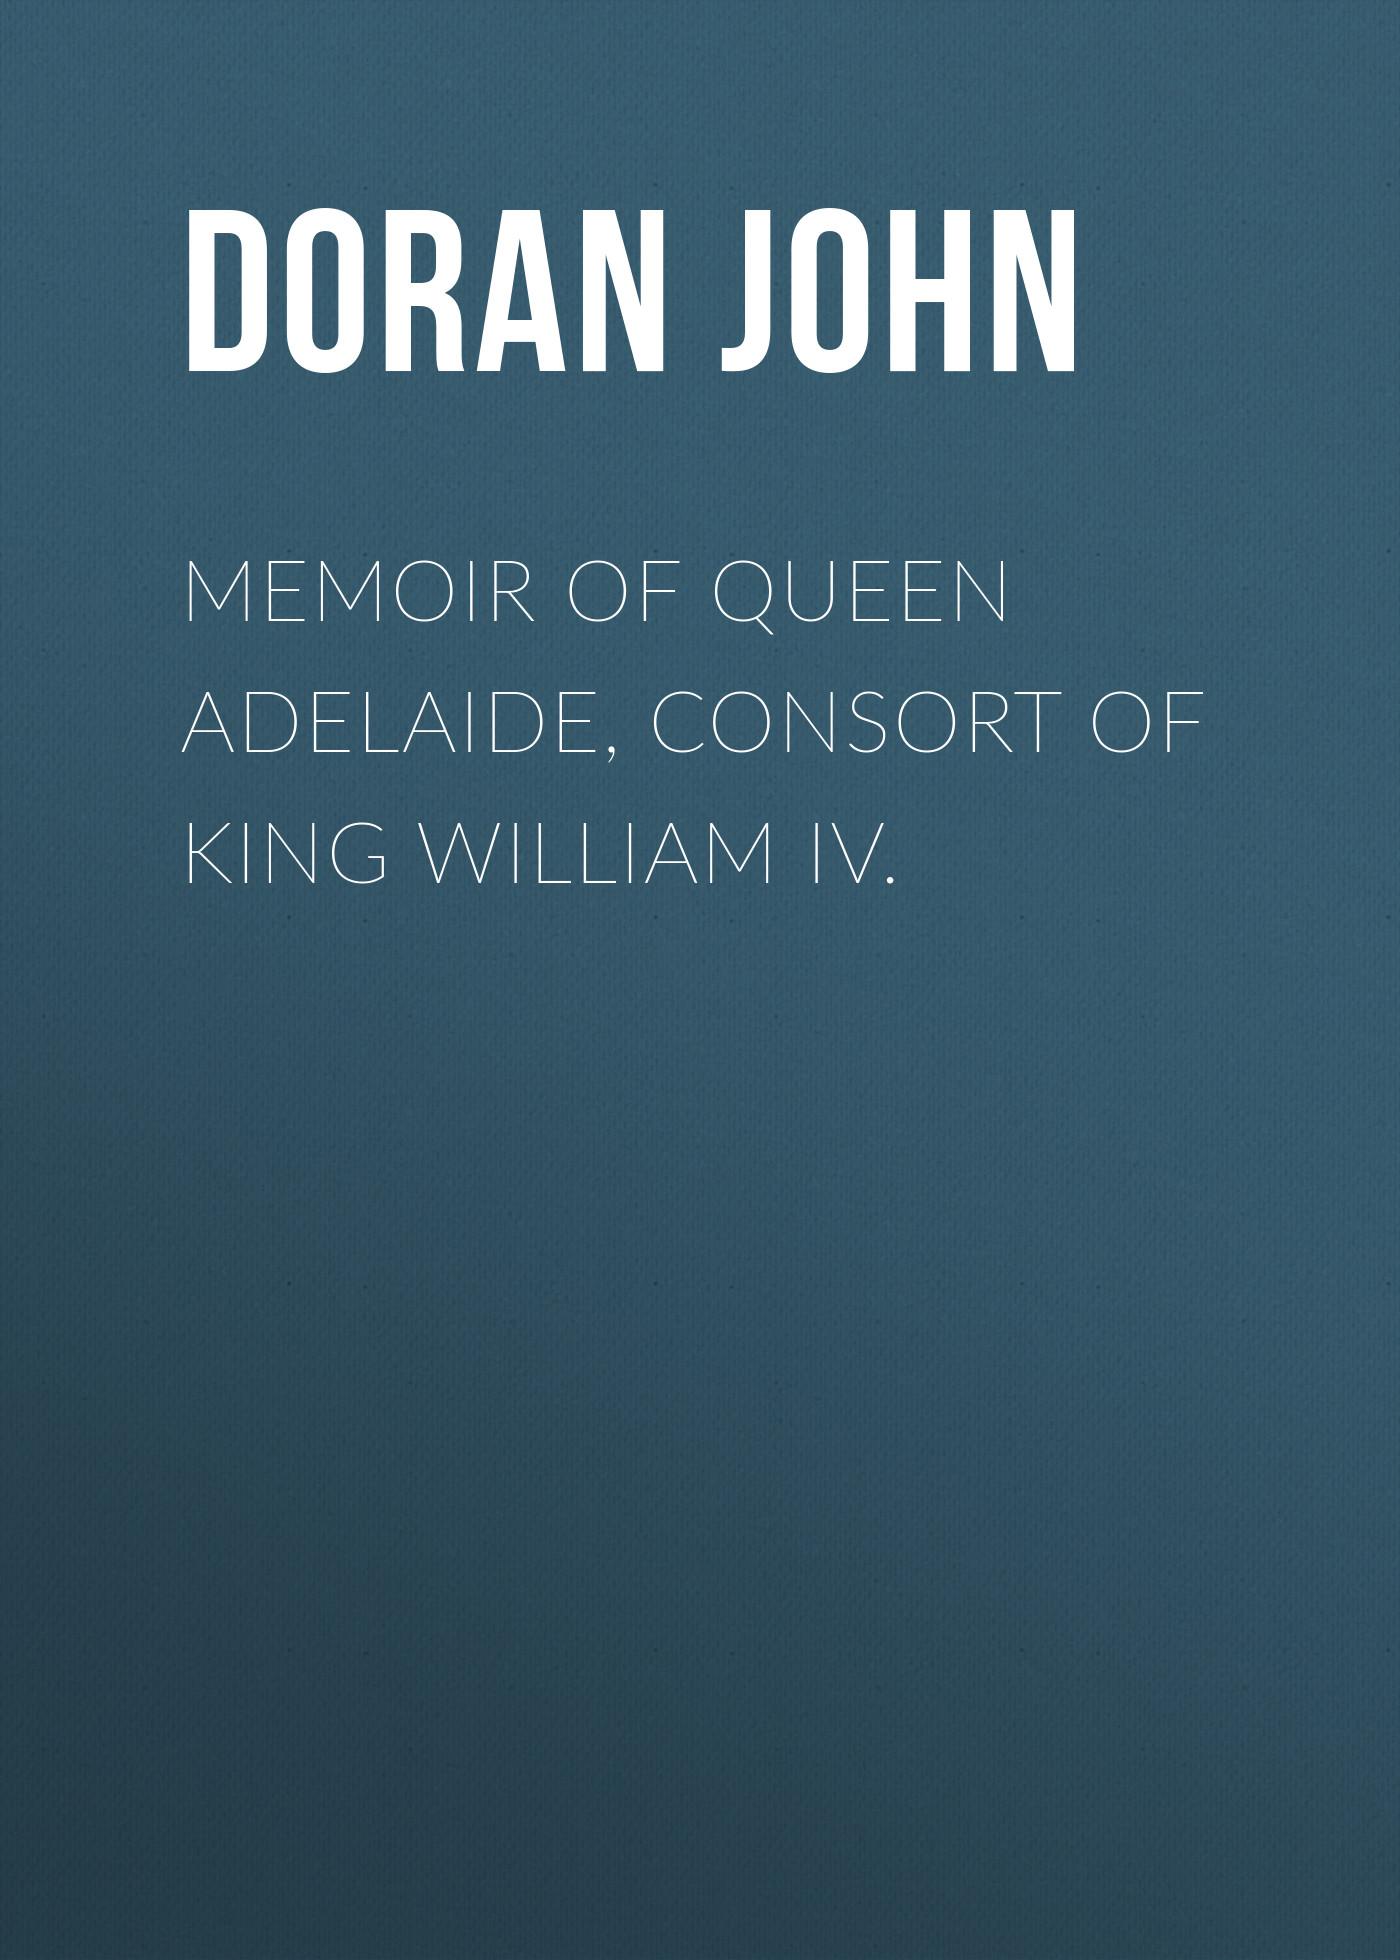 Doran John Memoir of Queen Adelaide, Consort of King William IV. john grisham the king of torts